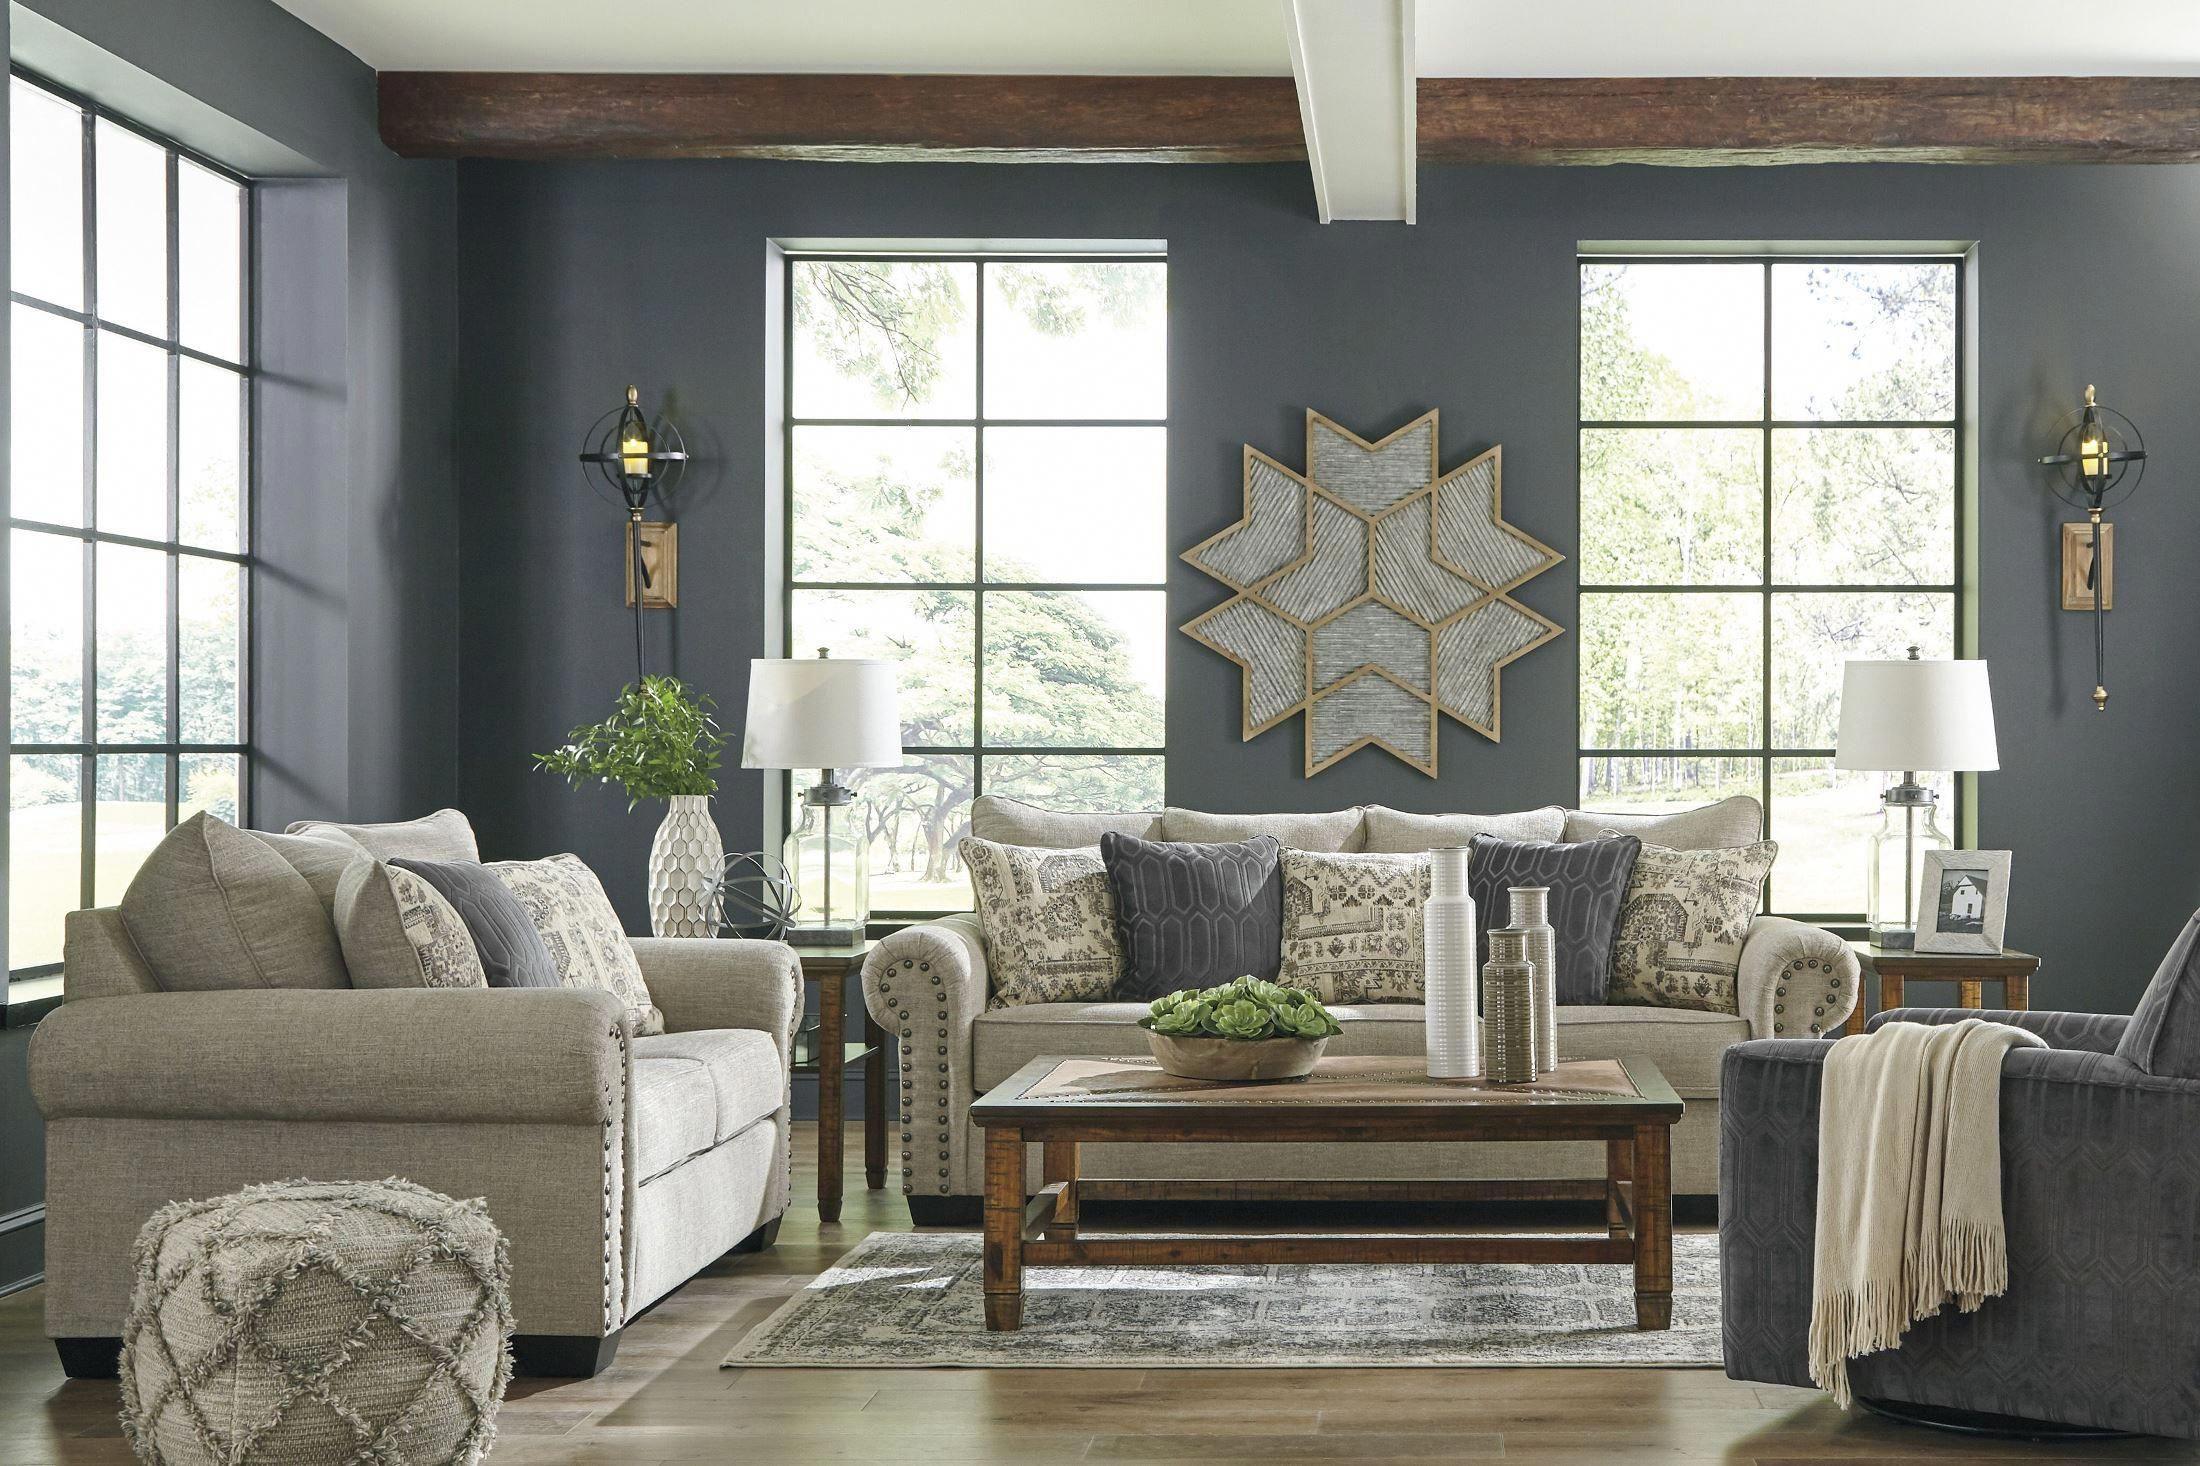 Zarina Jute Living Room Set Asl 9770438 Room Livingroomfurniturelayoutsofatables In 2020 Living Room Sets Queen Sofa Sleeper Ashley Furniture